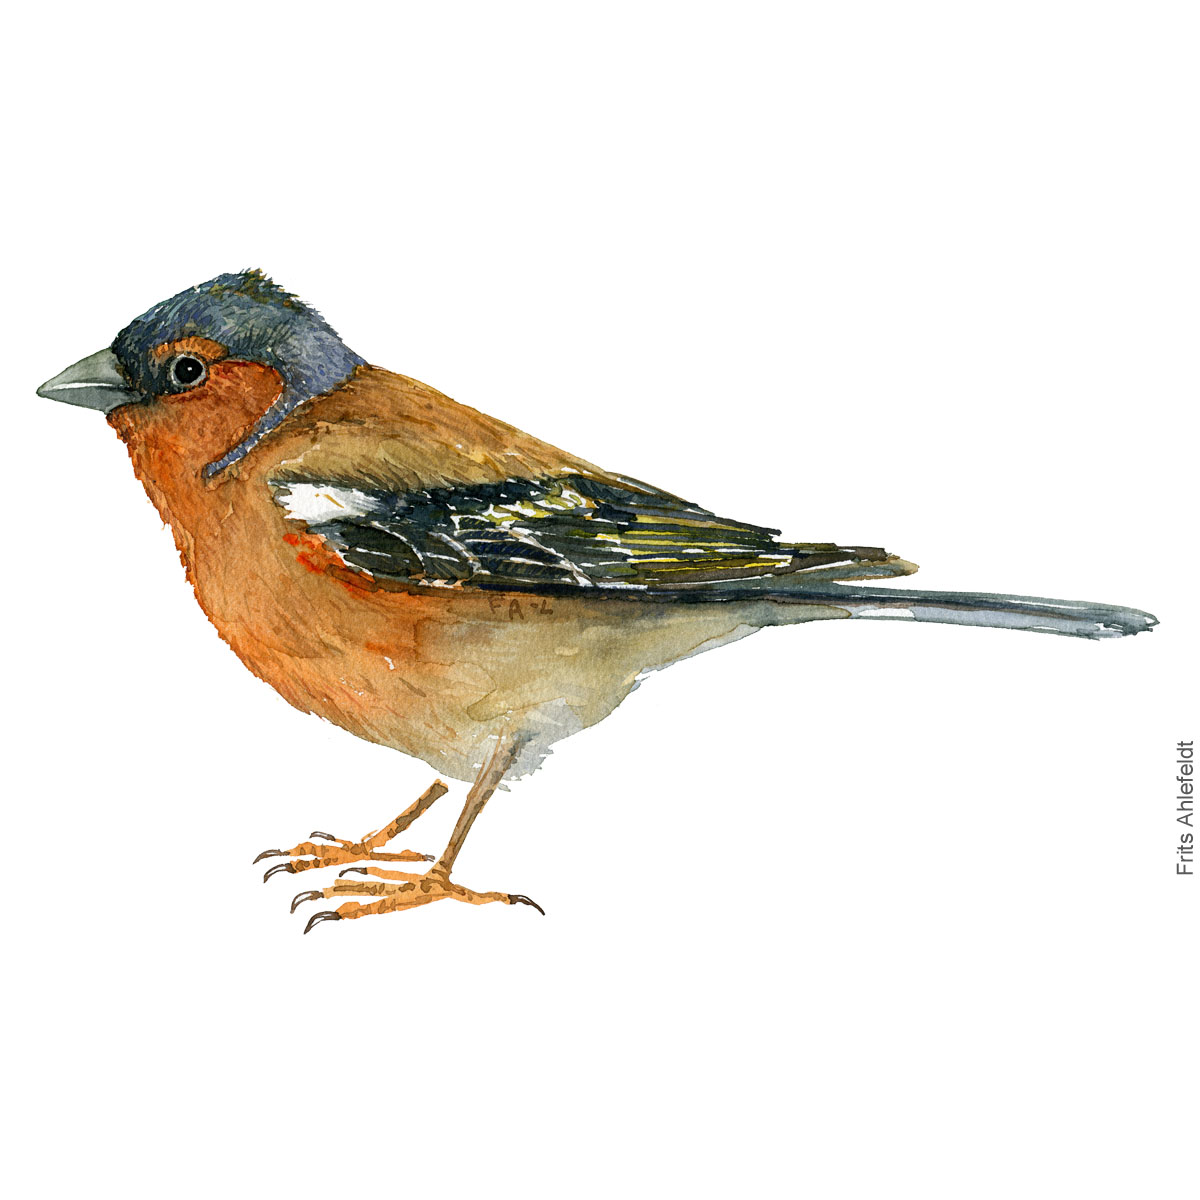 Common Chaffinch - Bogfinke Akvarel. Watercolor bird illustration by Frits Ahlefeldt